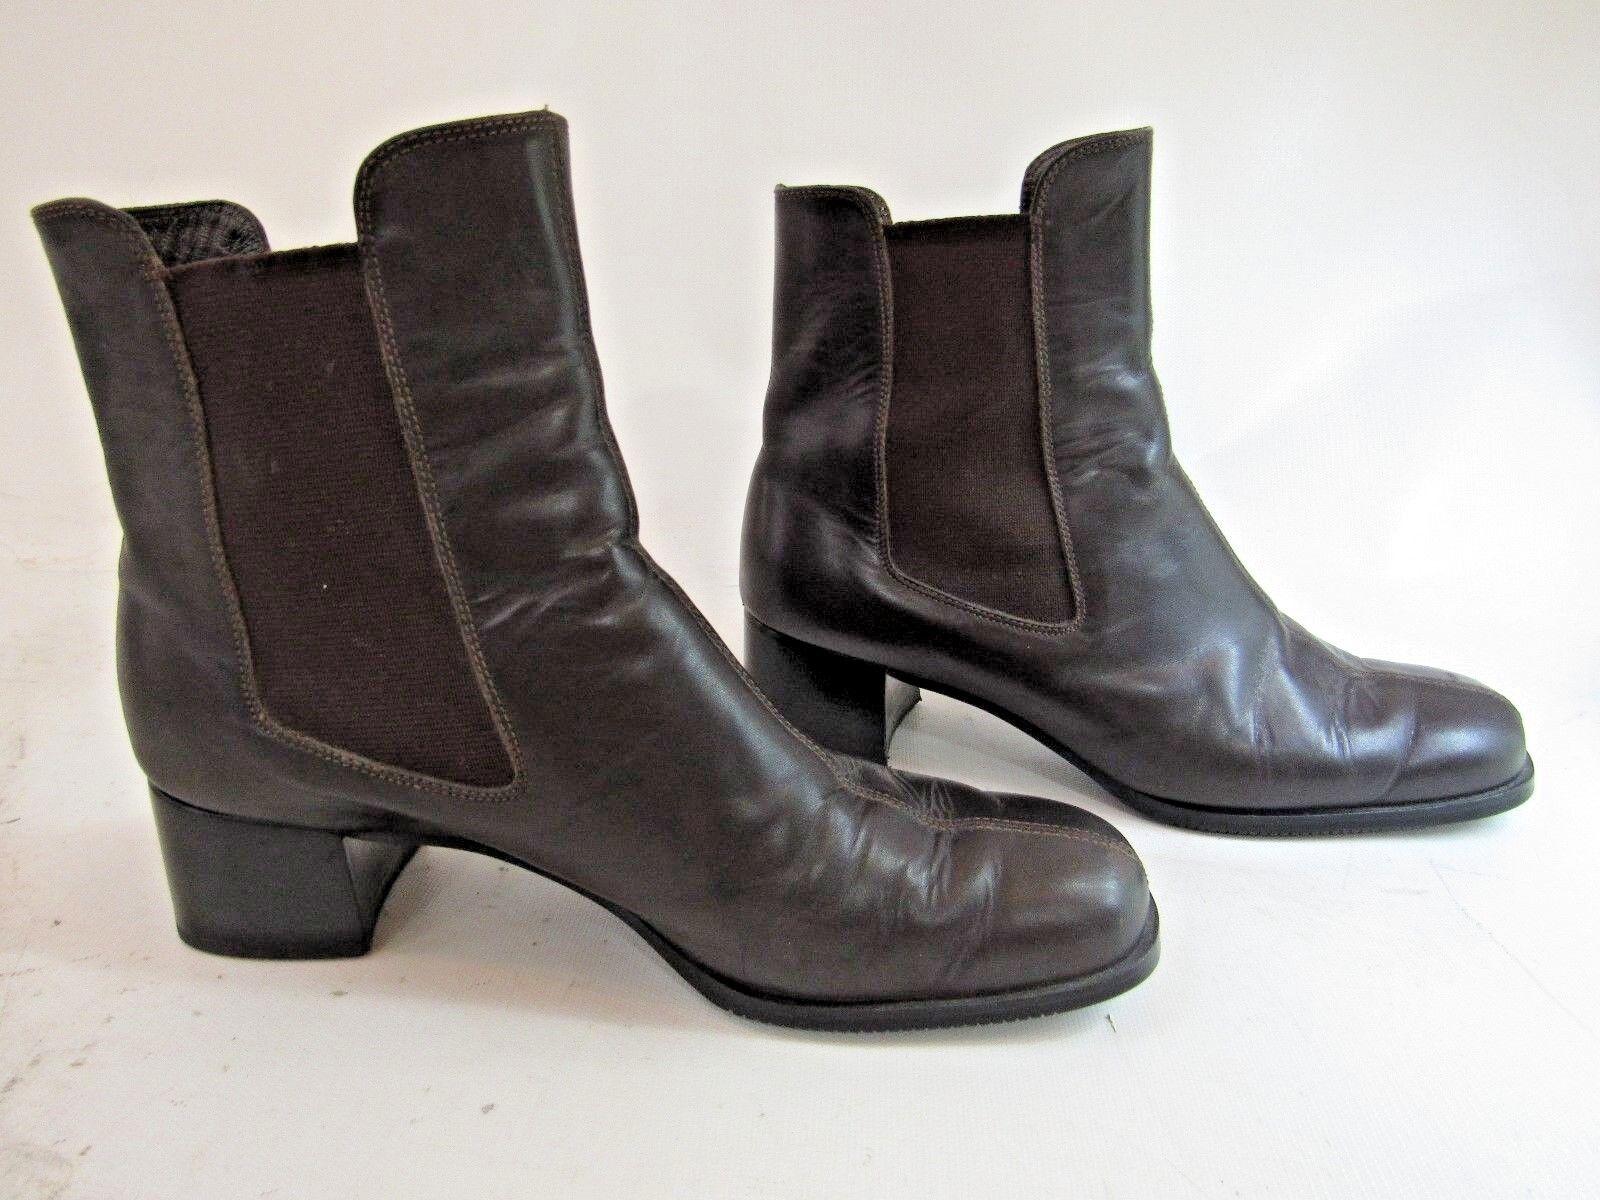 SALVATORE FERRAGAMO Brown Leather Stretch Ankle Boot Boot Boot Size 7 EUC bfbeda